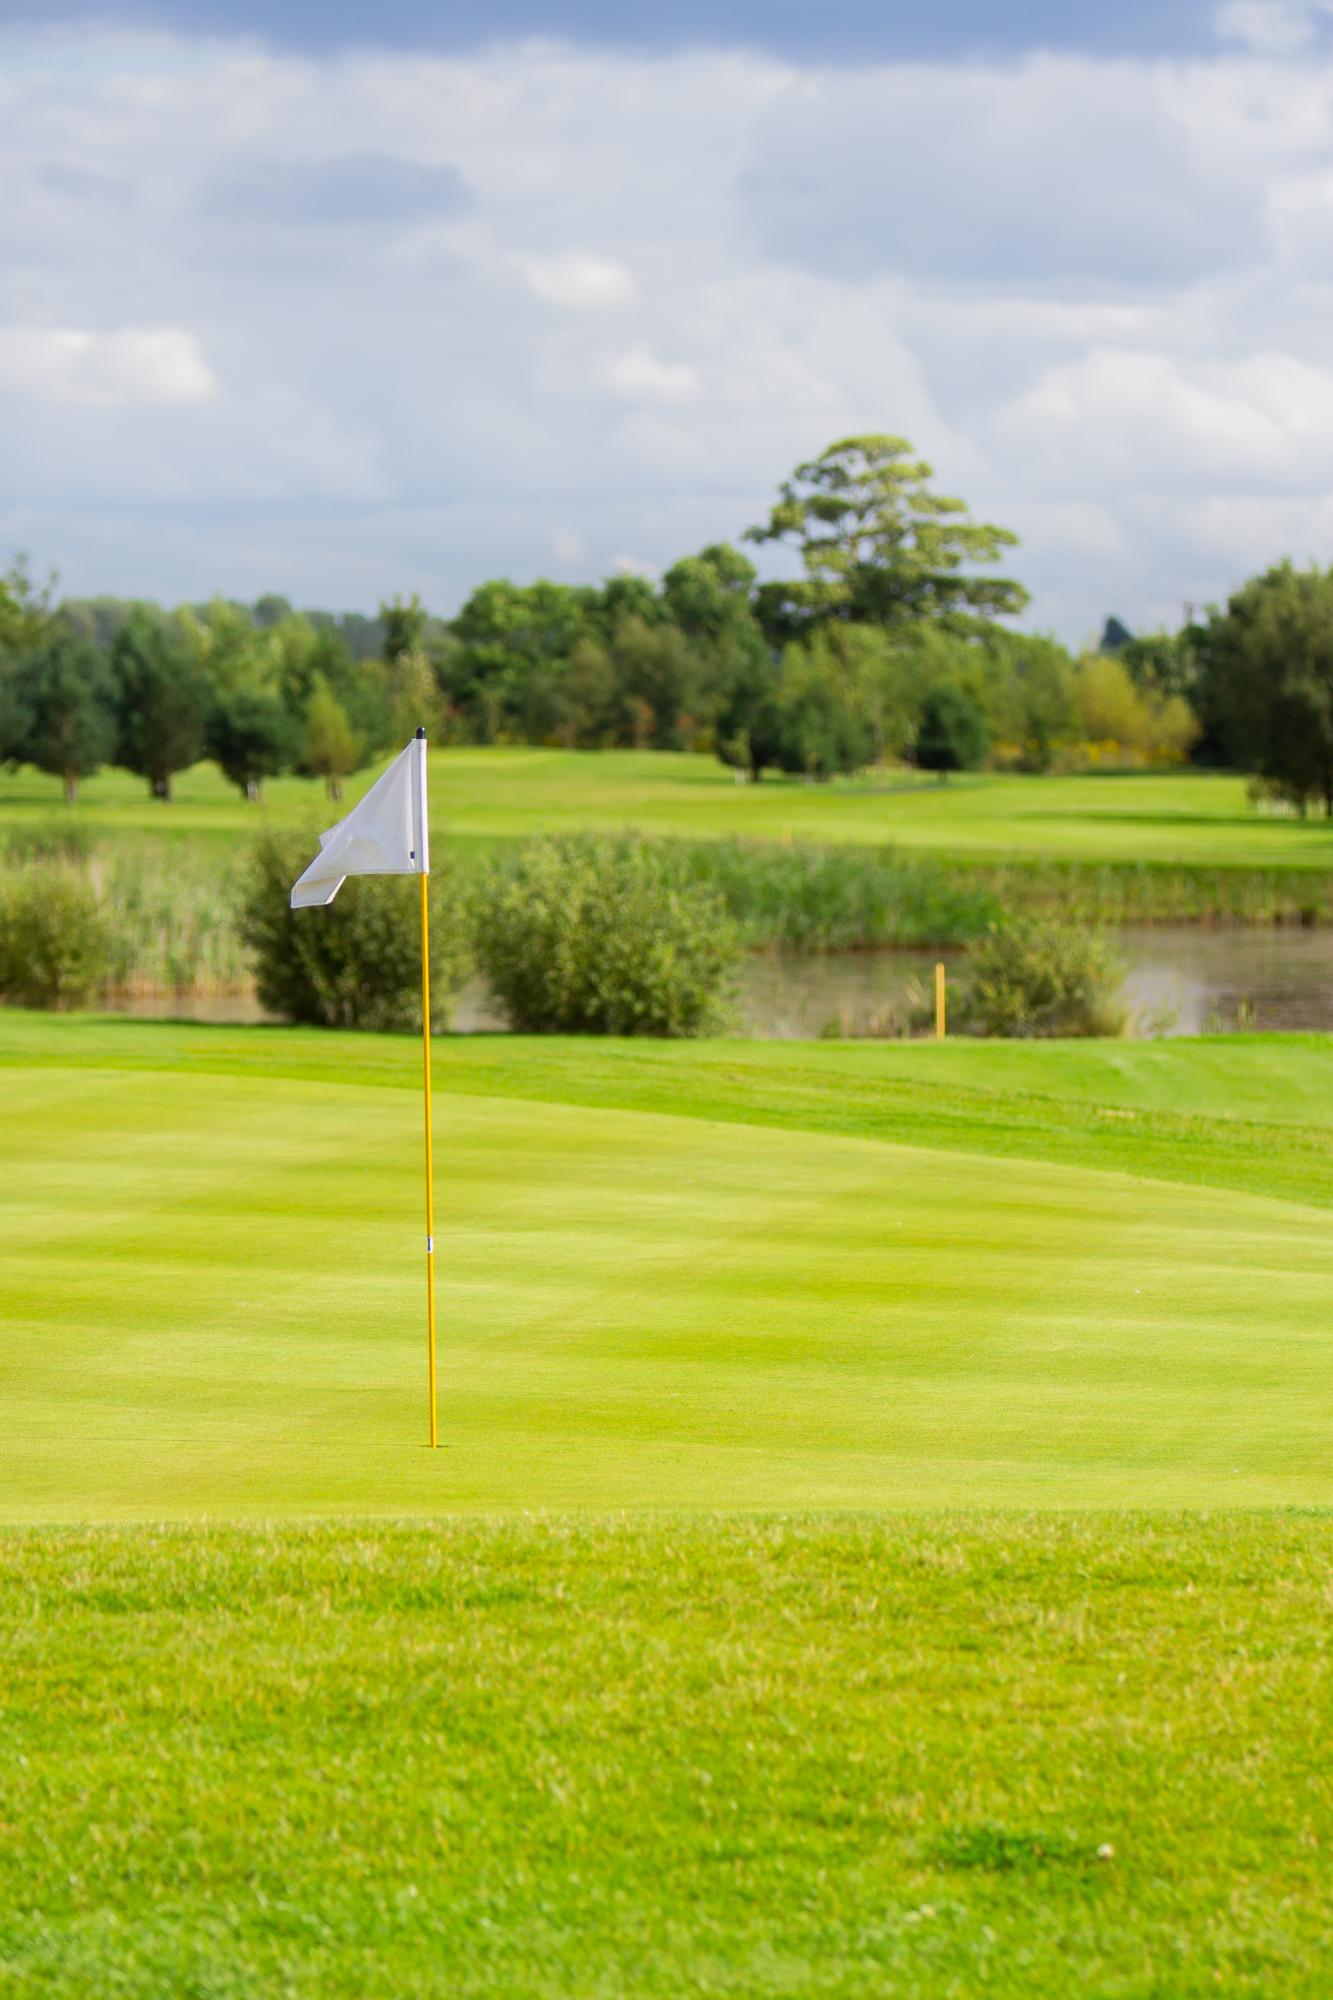 usga greens, golf course near hull